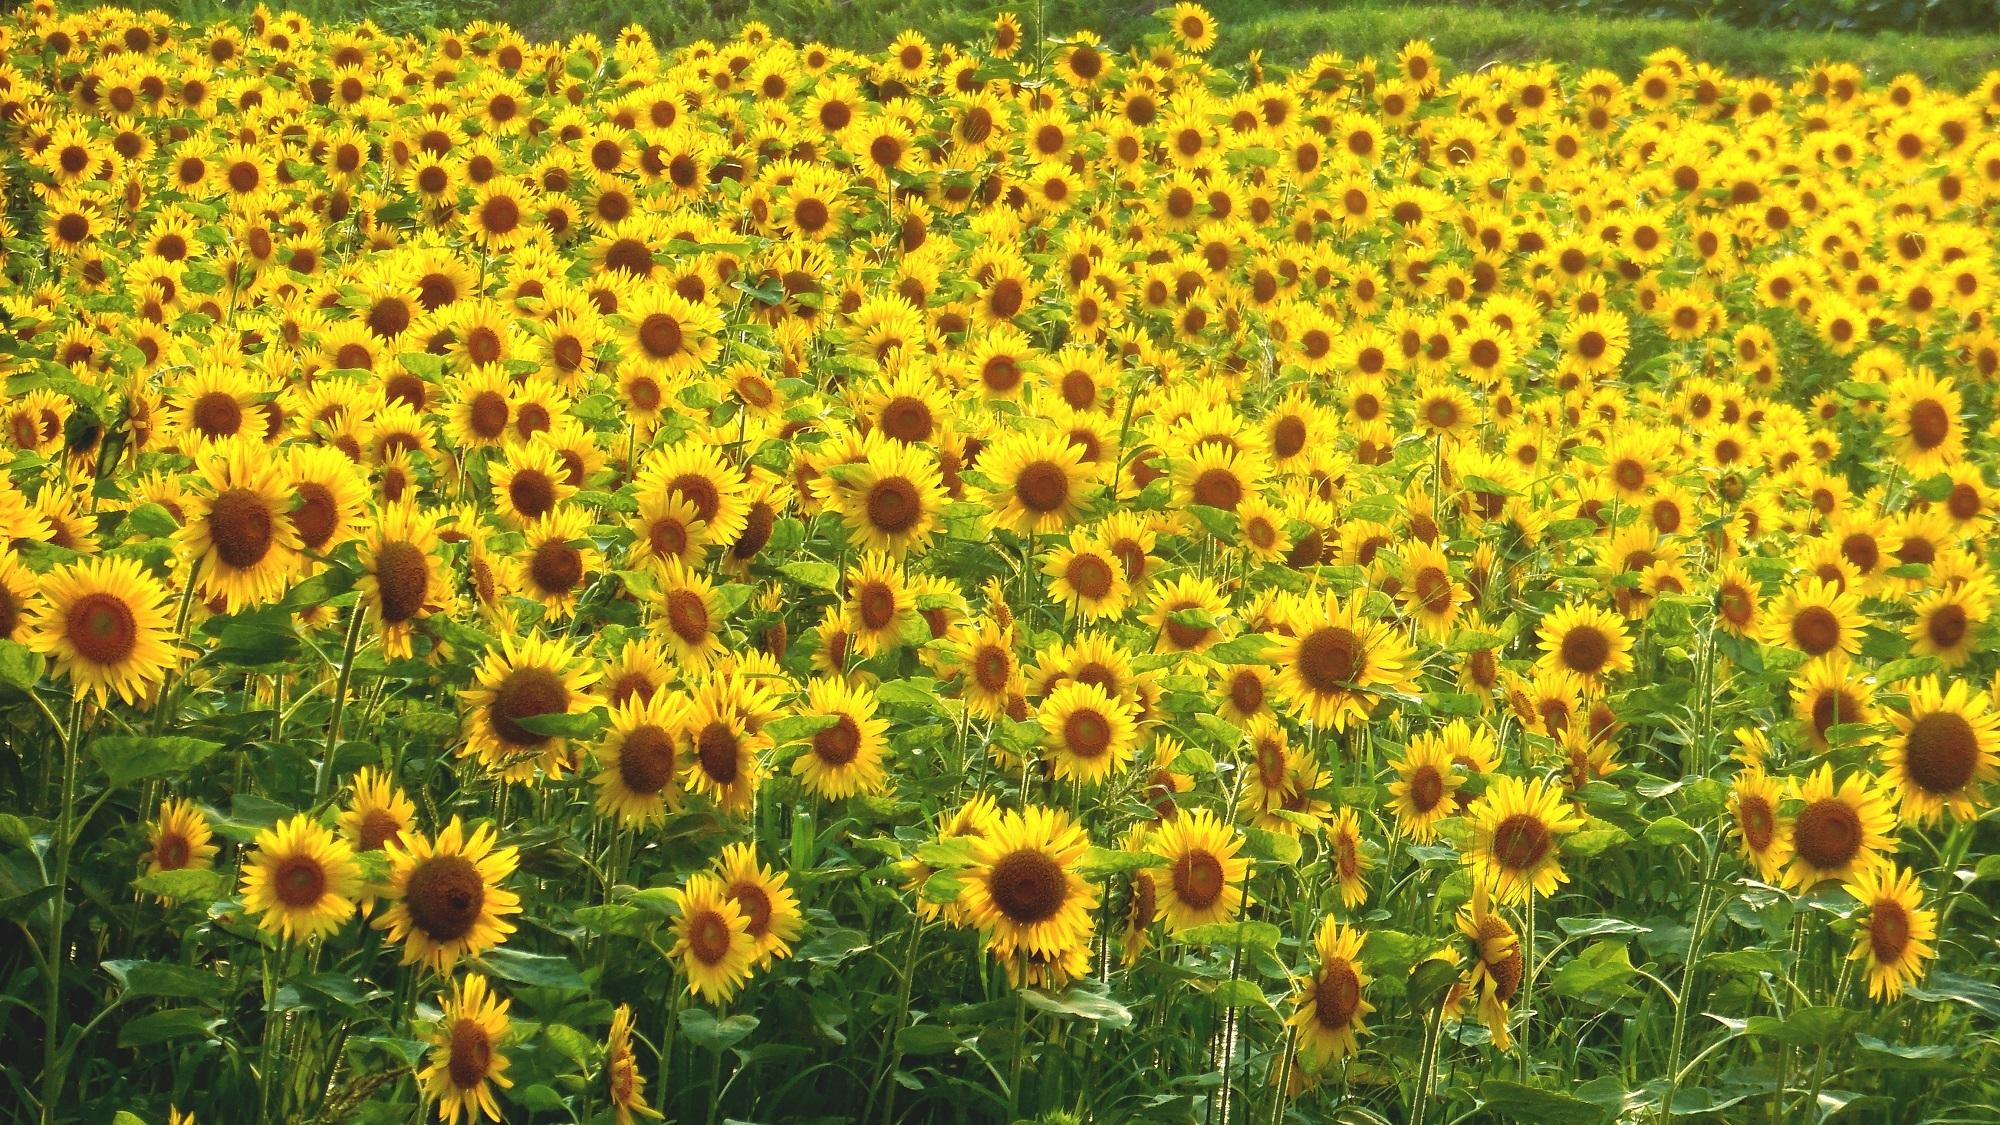 DSCN4465-向日葵の笑顔-2000